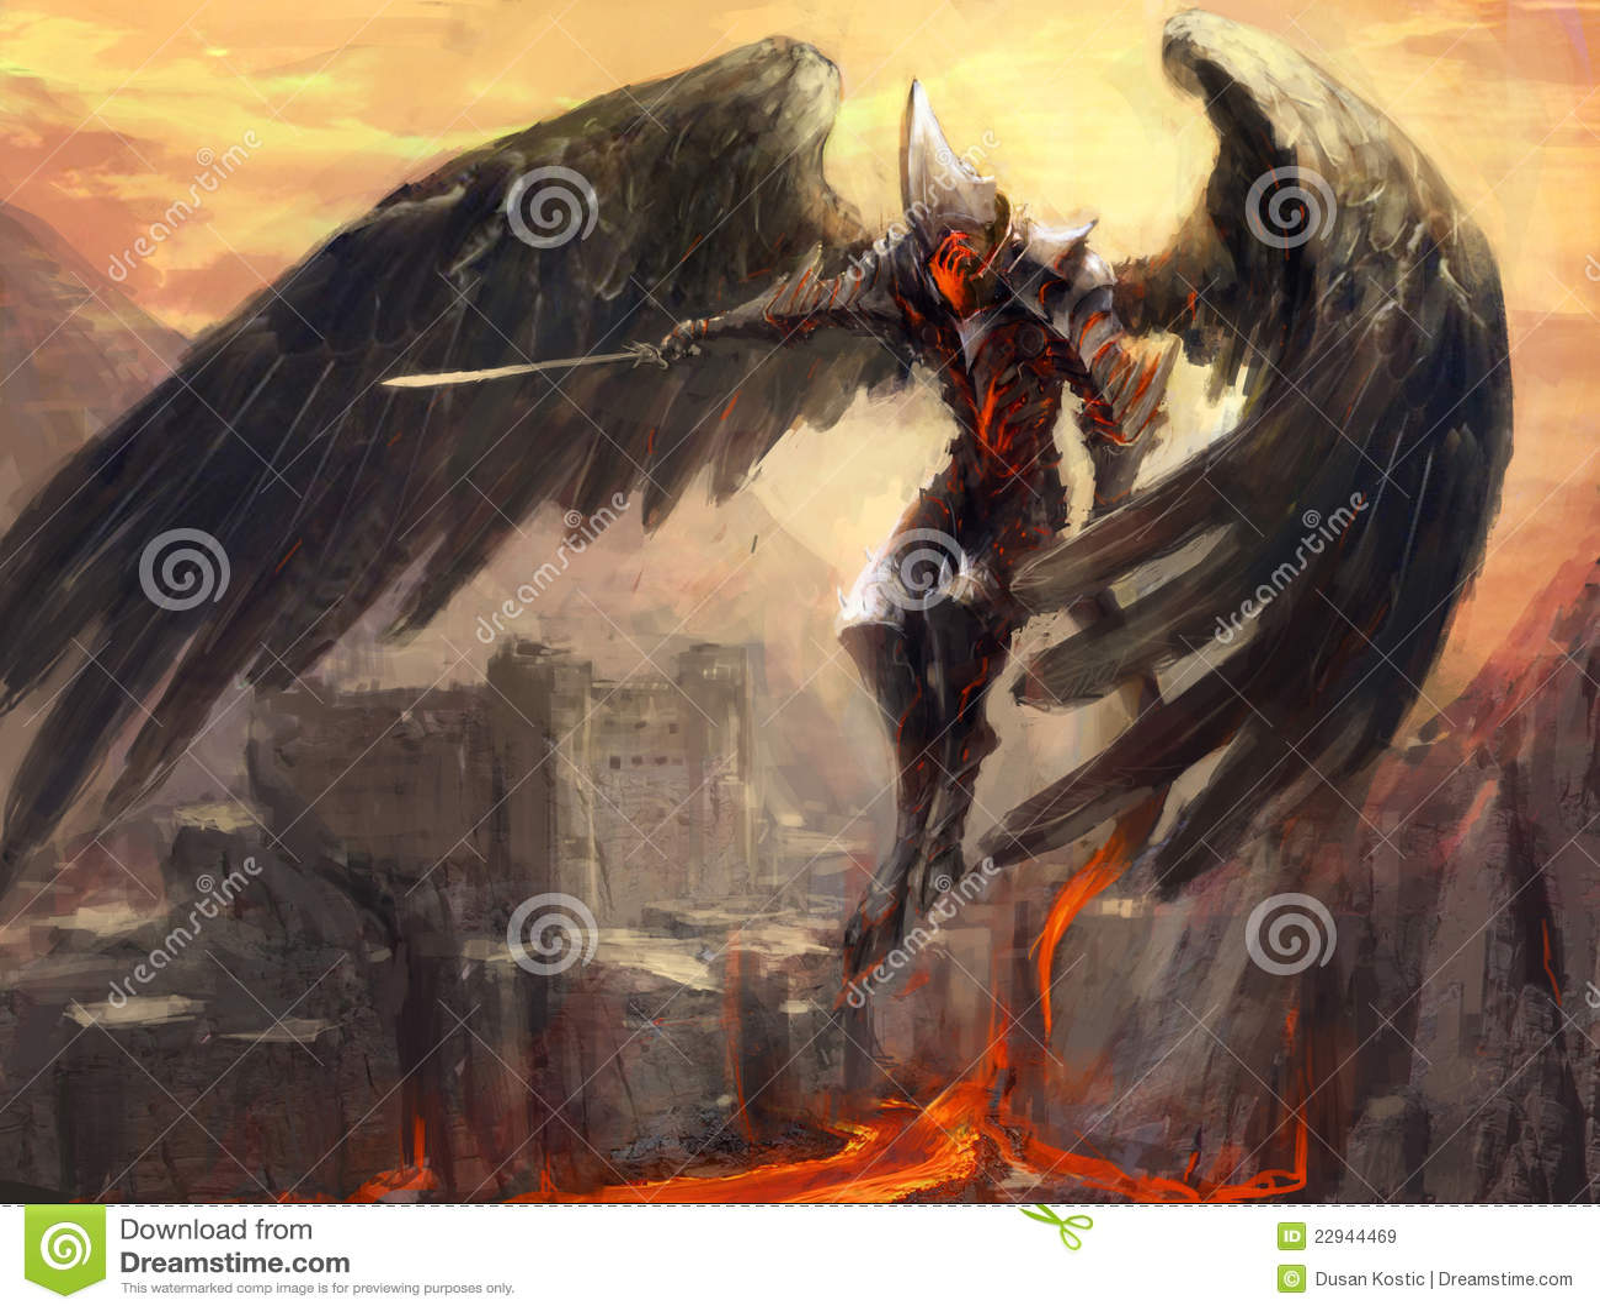 Armageddon Royalty Free Stock Images - Image: 22944469